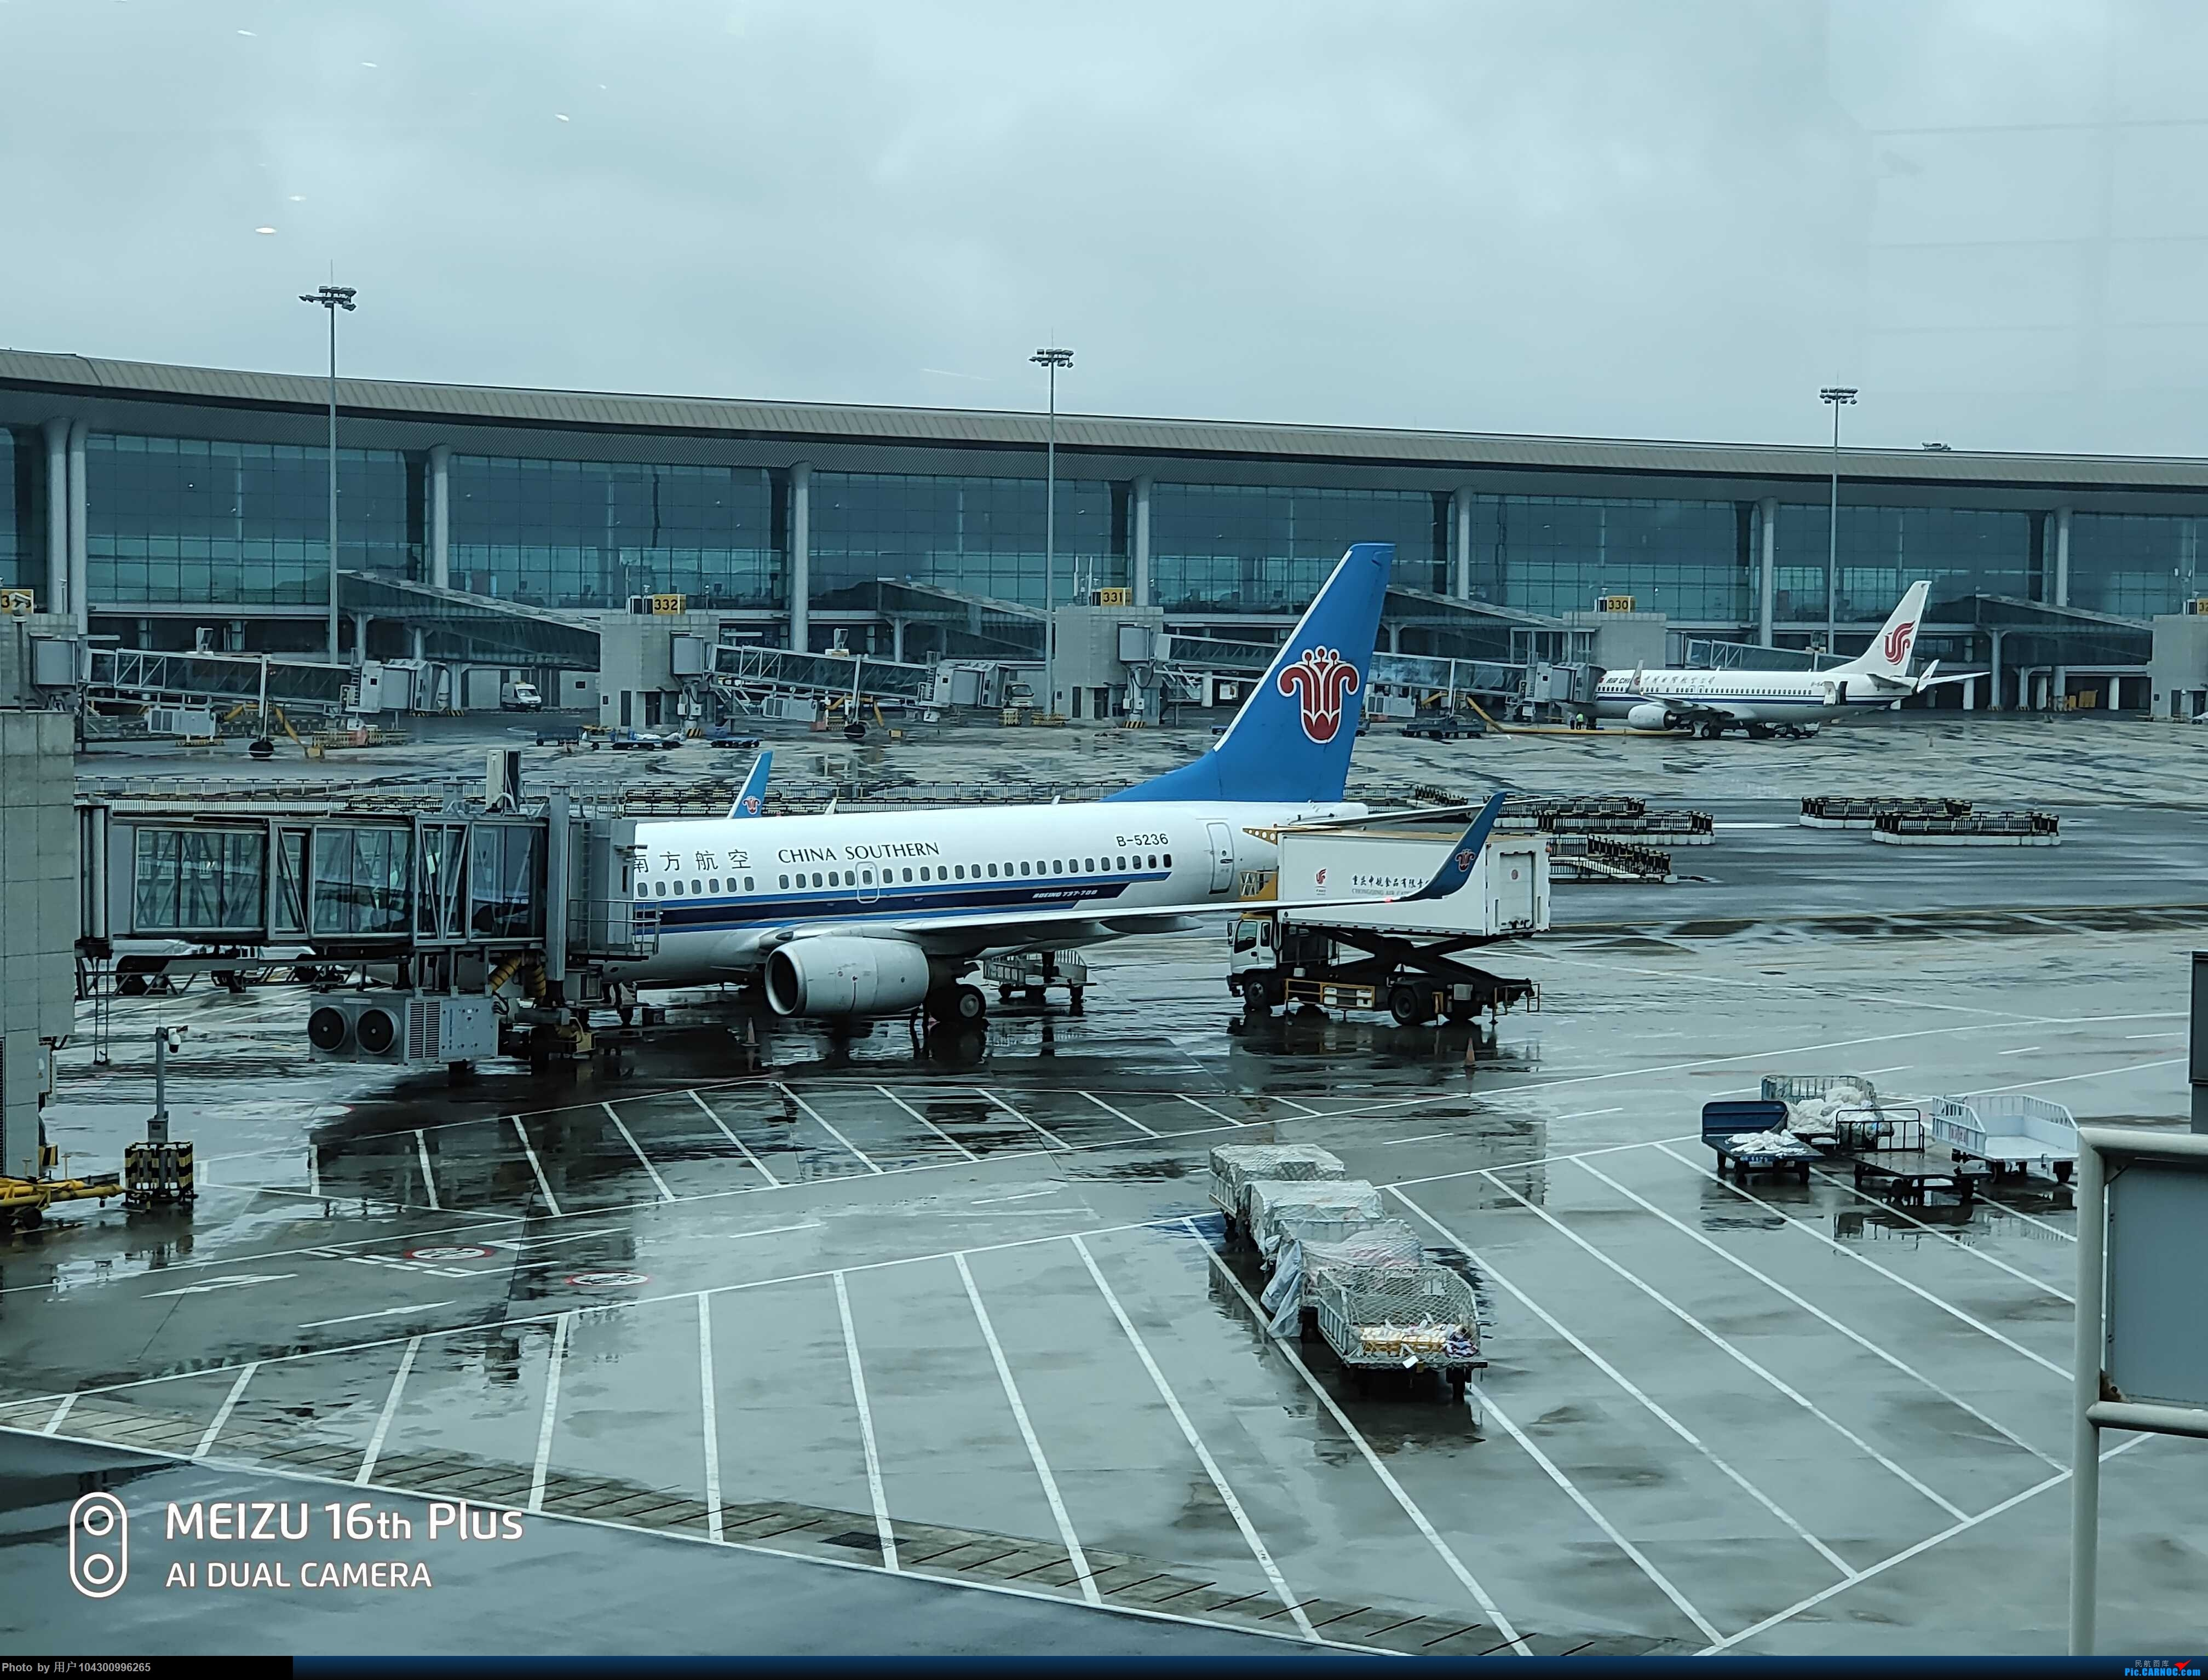 Re:[原创]〖DM哥游记〗多彩贵州航空~重庆--贵阳 BOEING 737-700 B-5236 中国重庆江北国际机场